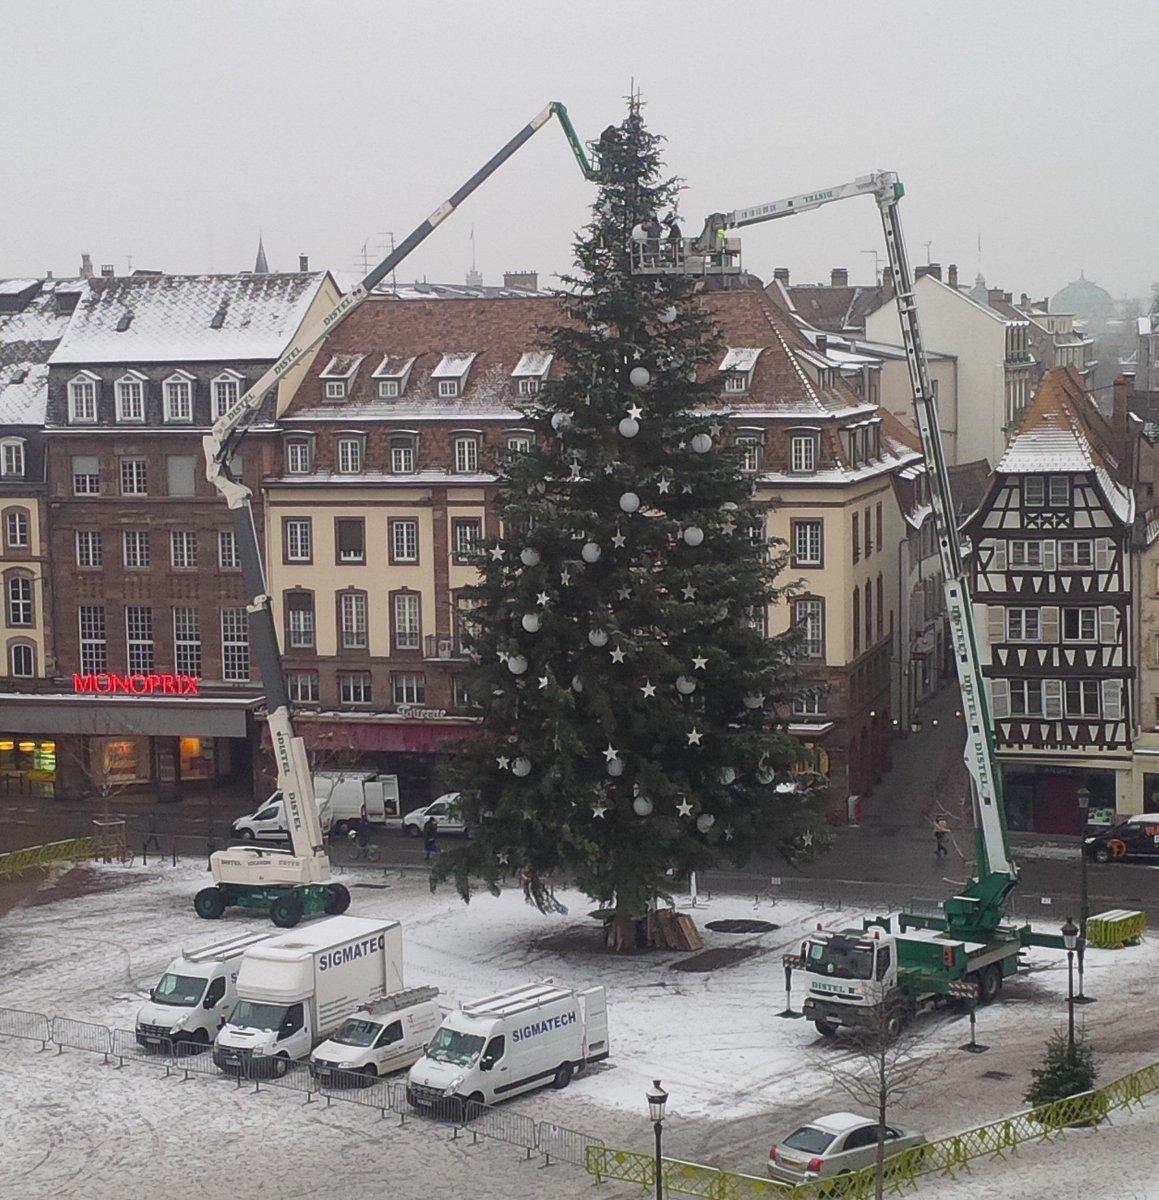 Démontage... Snif #Strasbourg #radiorbs #matinale #Sapin #noël #demonter #foret #bucherons   @strasbourg<br>http://pic.twitter.com/sZ0RdrGjjk